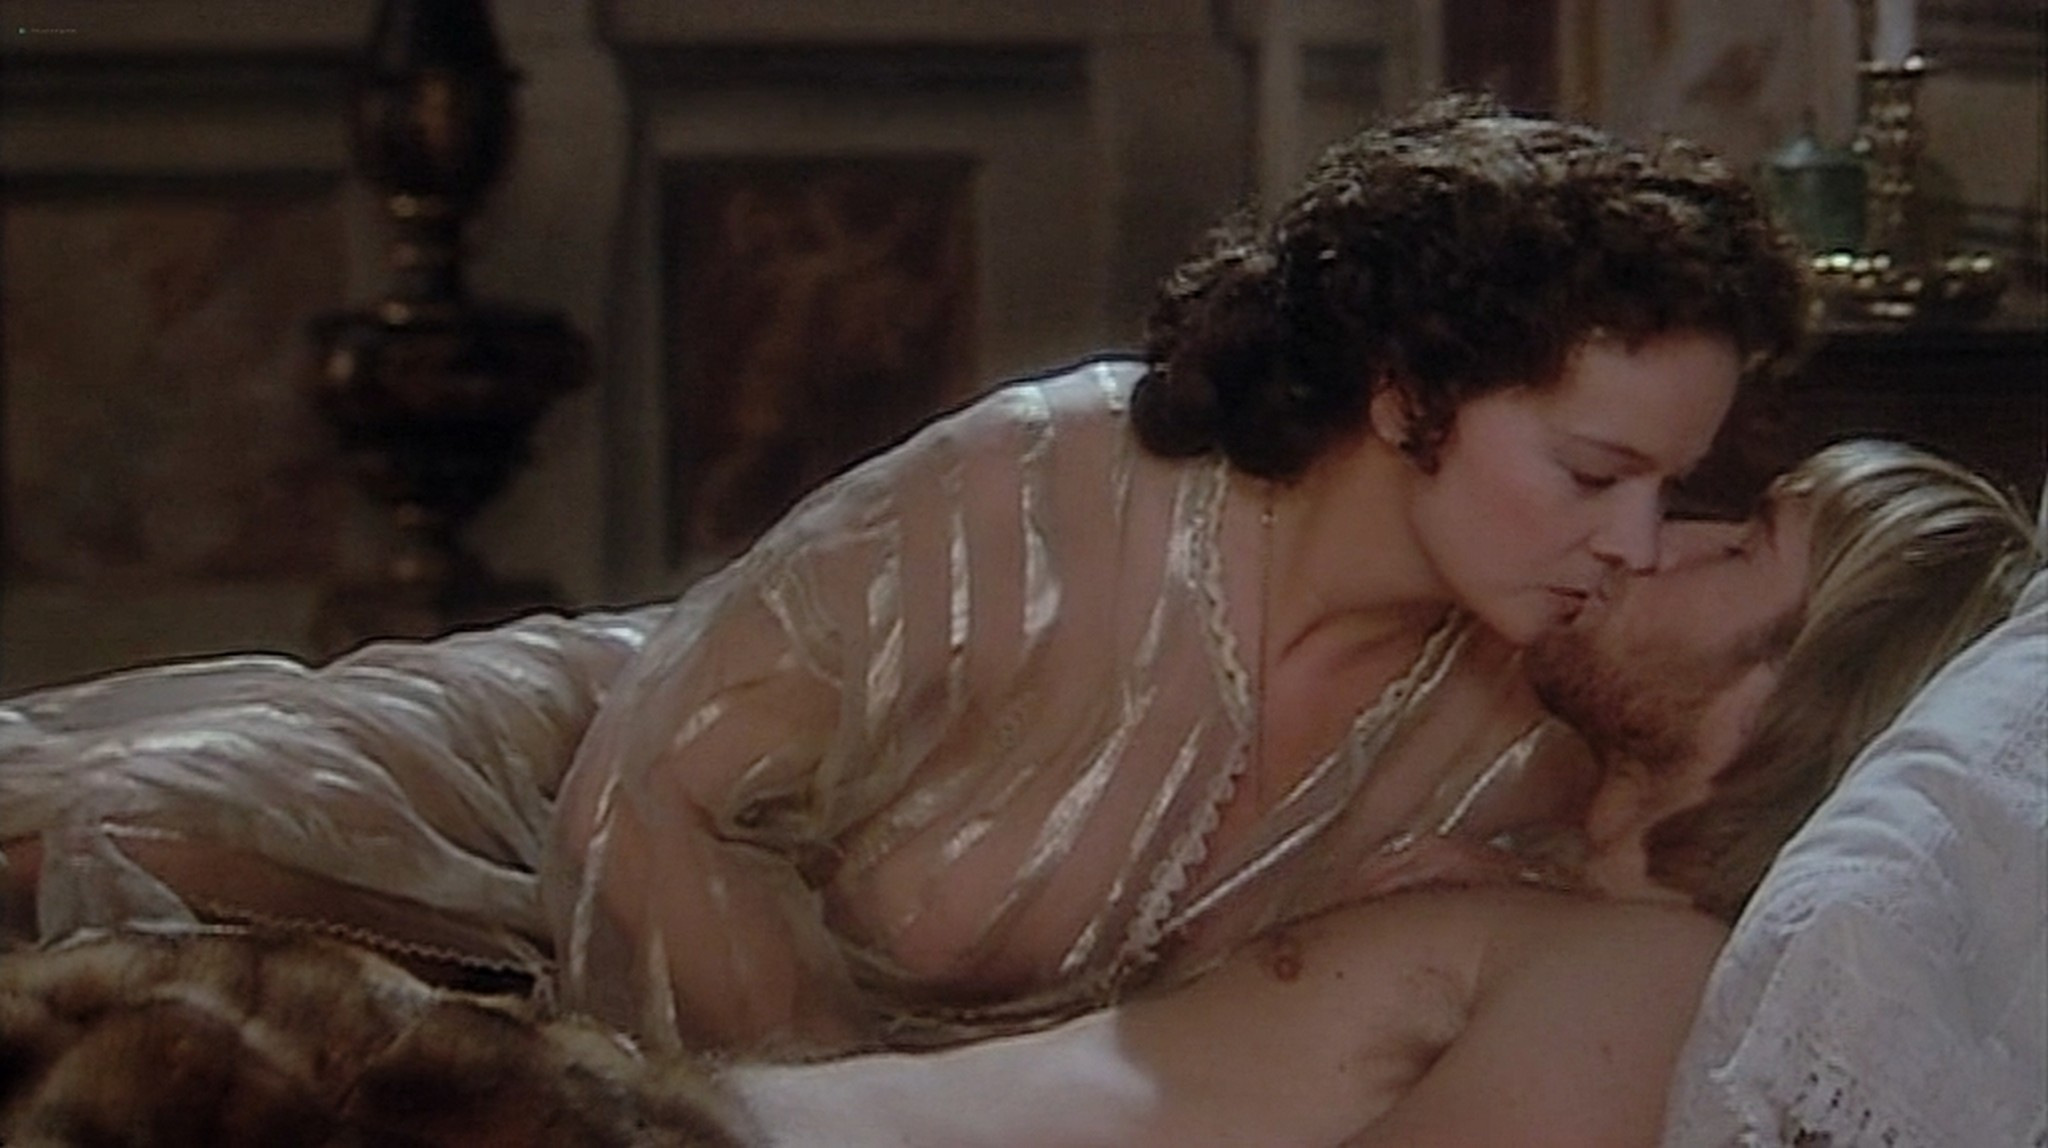 Laura Antonelli nude topless and sex Monica Guerritore nude topless and Clelia Rondinella nude lesbian sex La Venexiana 1986 DVDRip 16